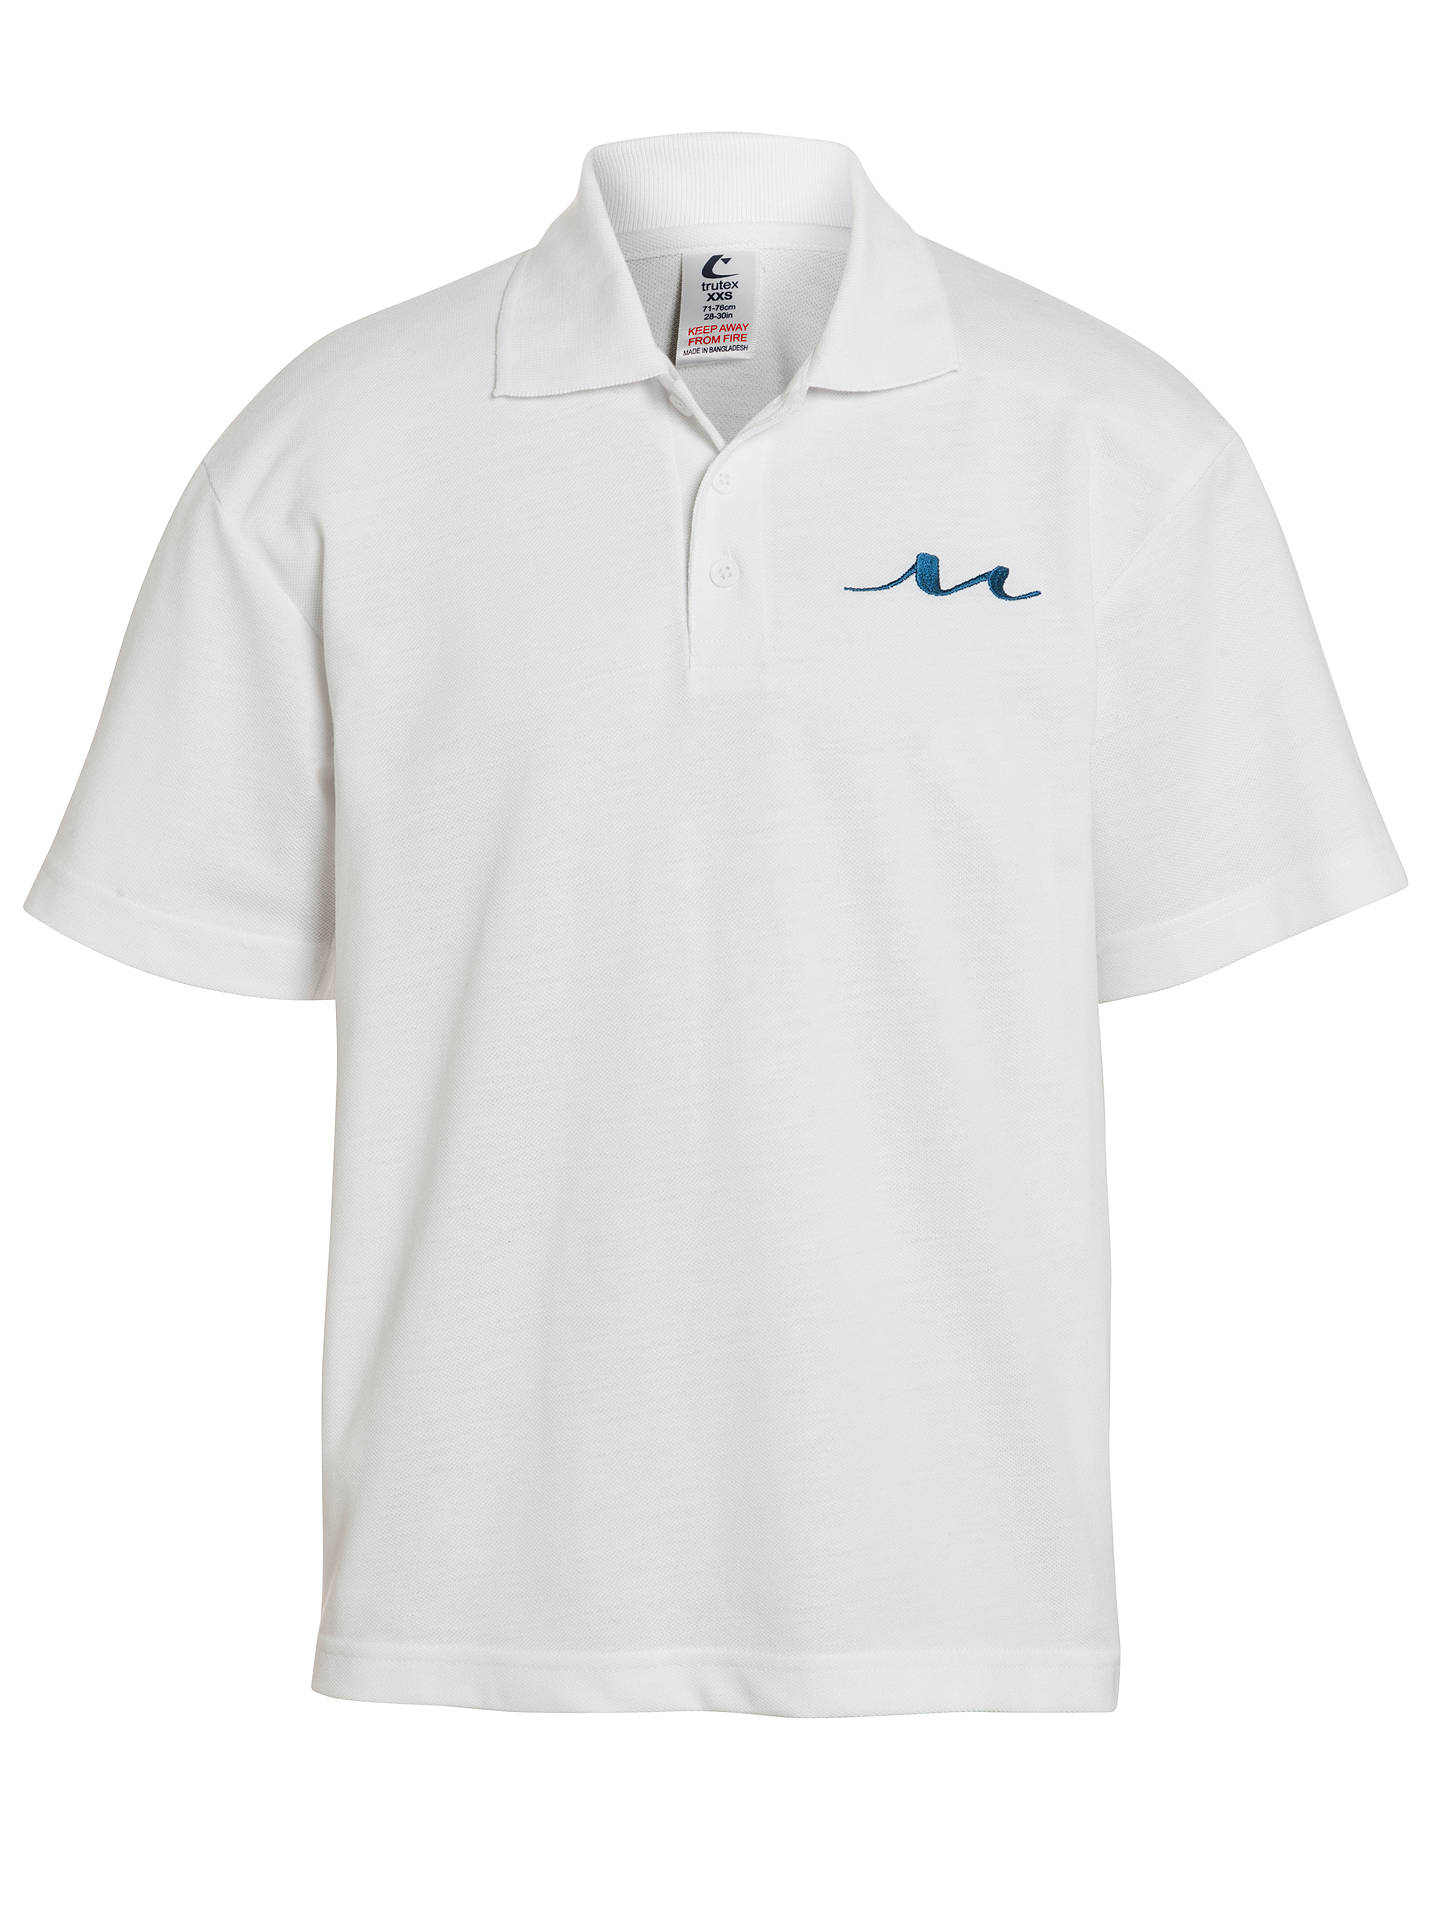 536bda01 Childrens Plain White Polo Shirts | Top Mode Depot